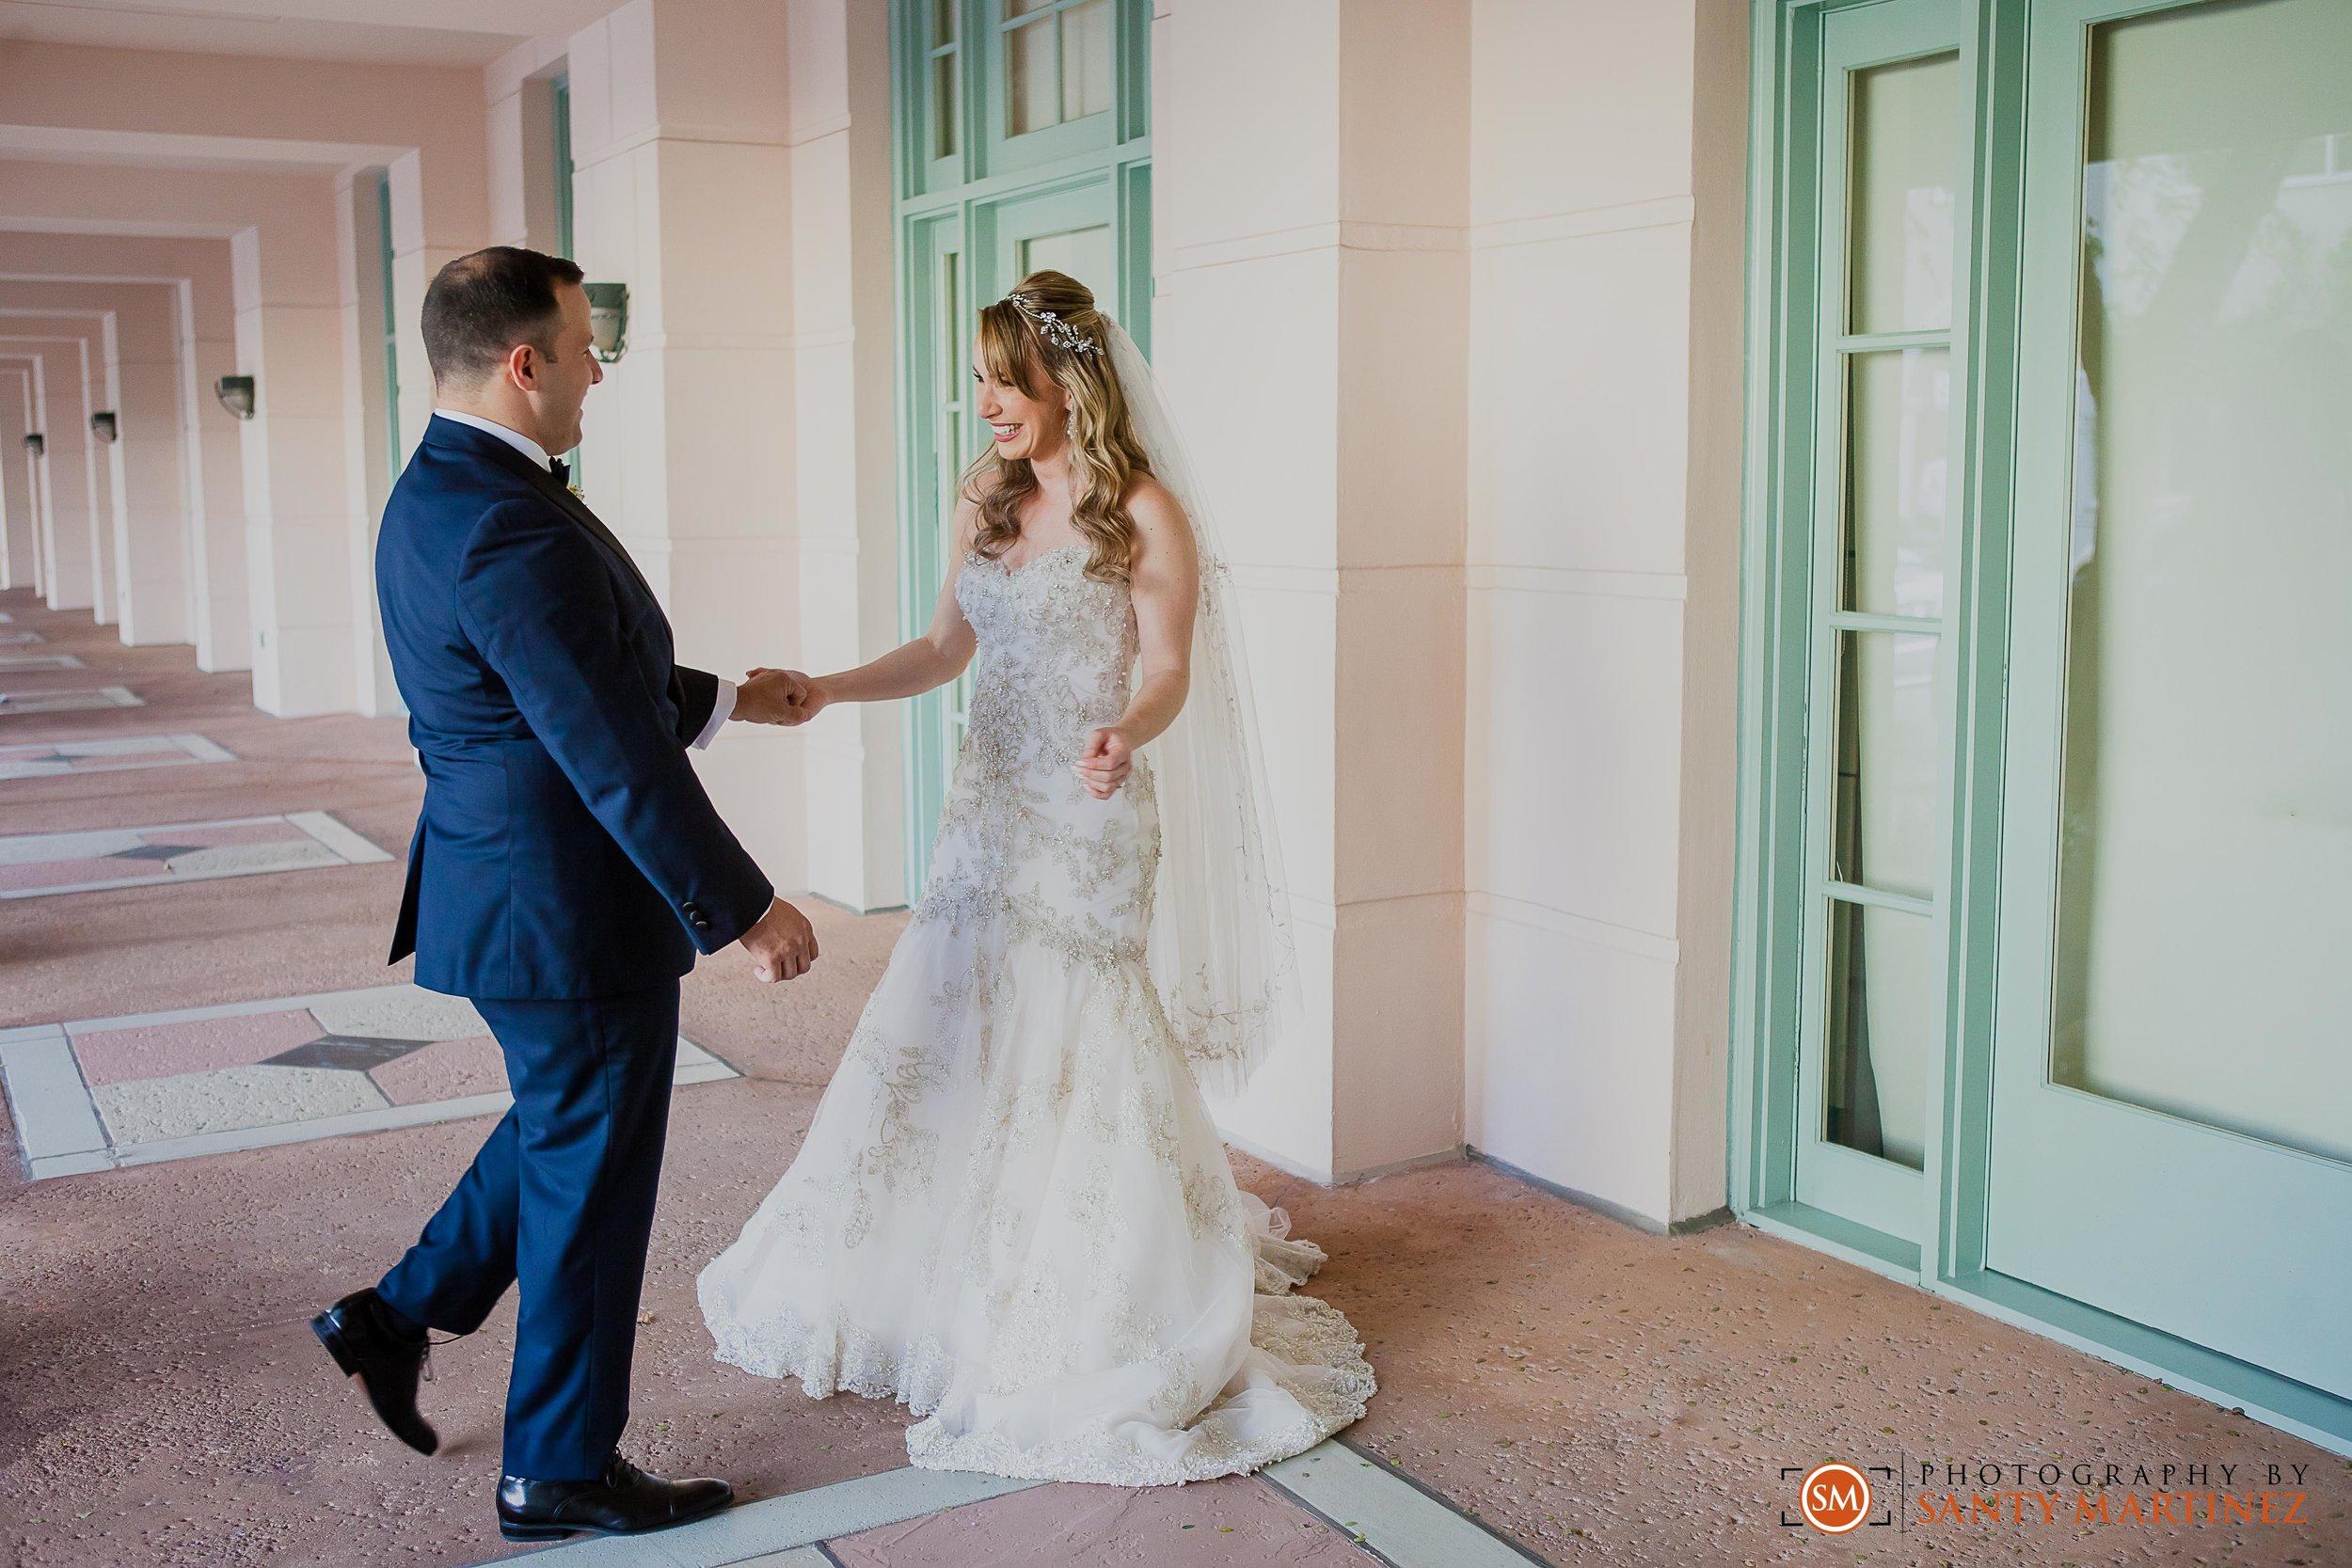 Wedding La Jolla Ballroom - Photography by Santy Martinez-18.jpg